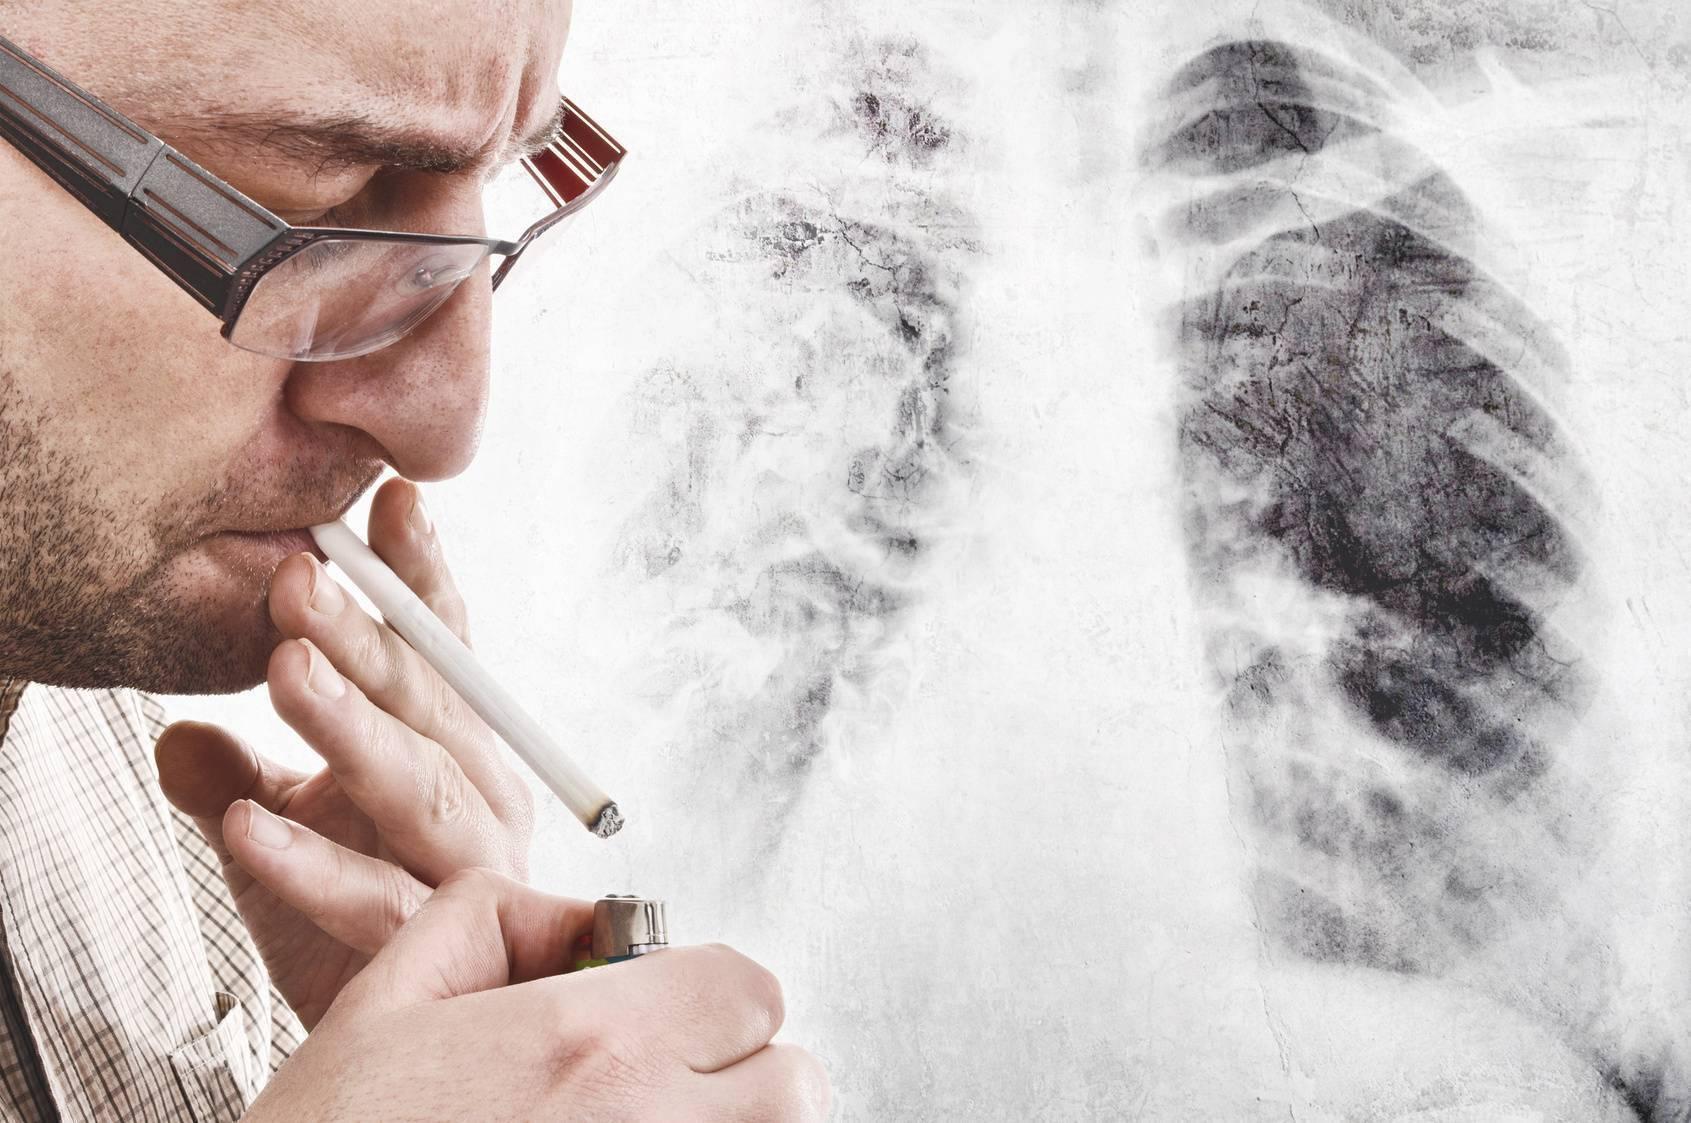 Влияет ли курение на зрение | как курение влияет на зрение